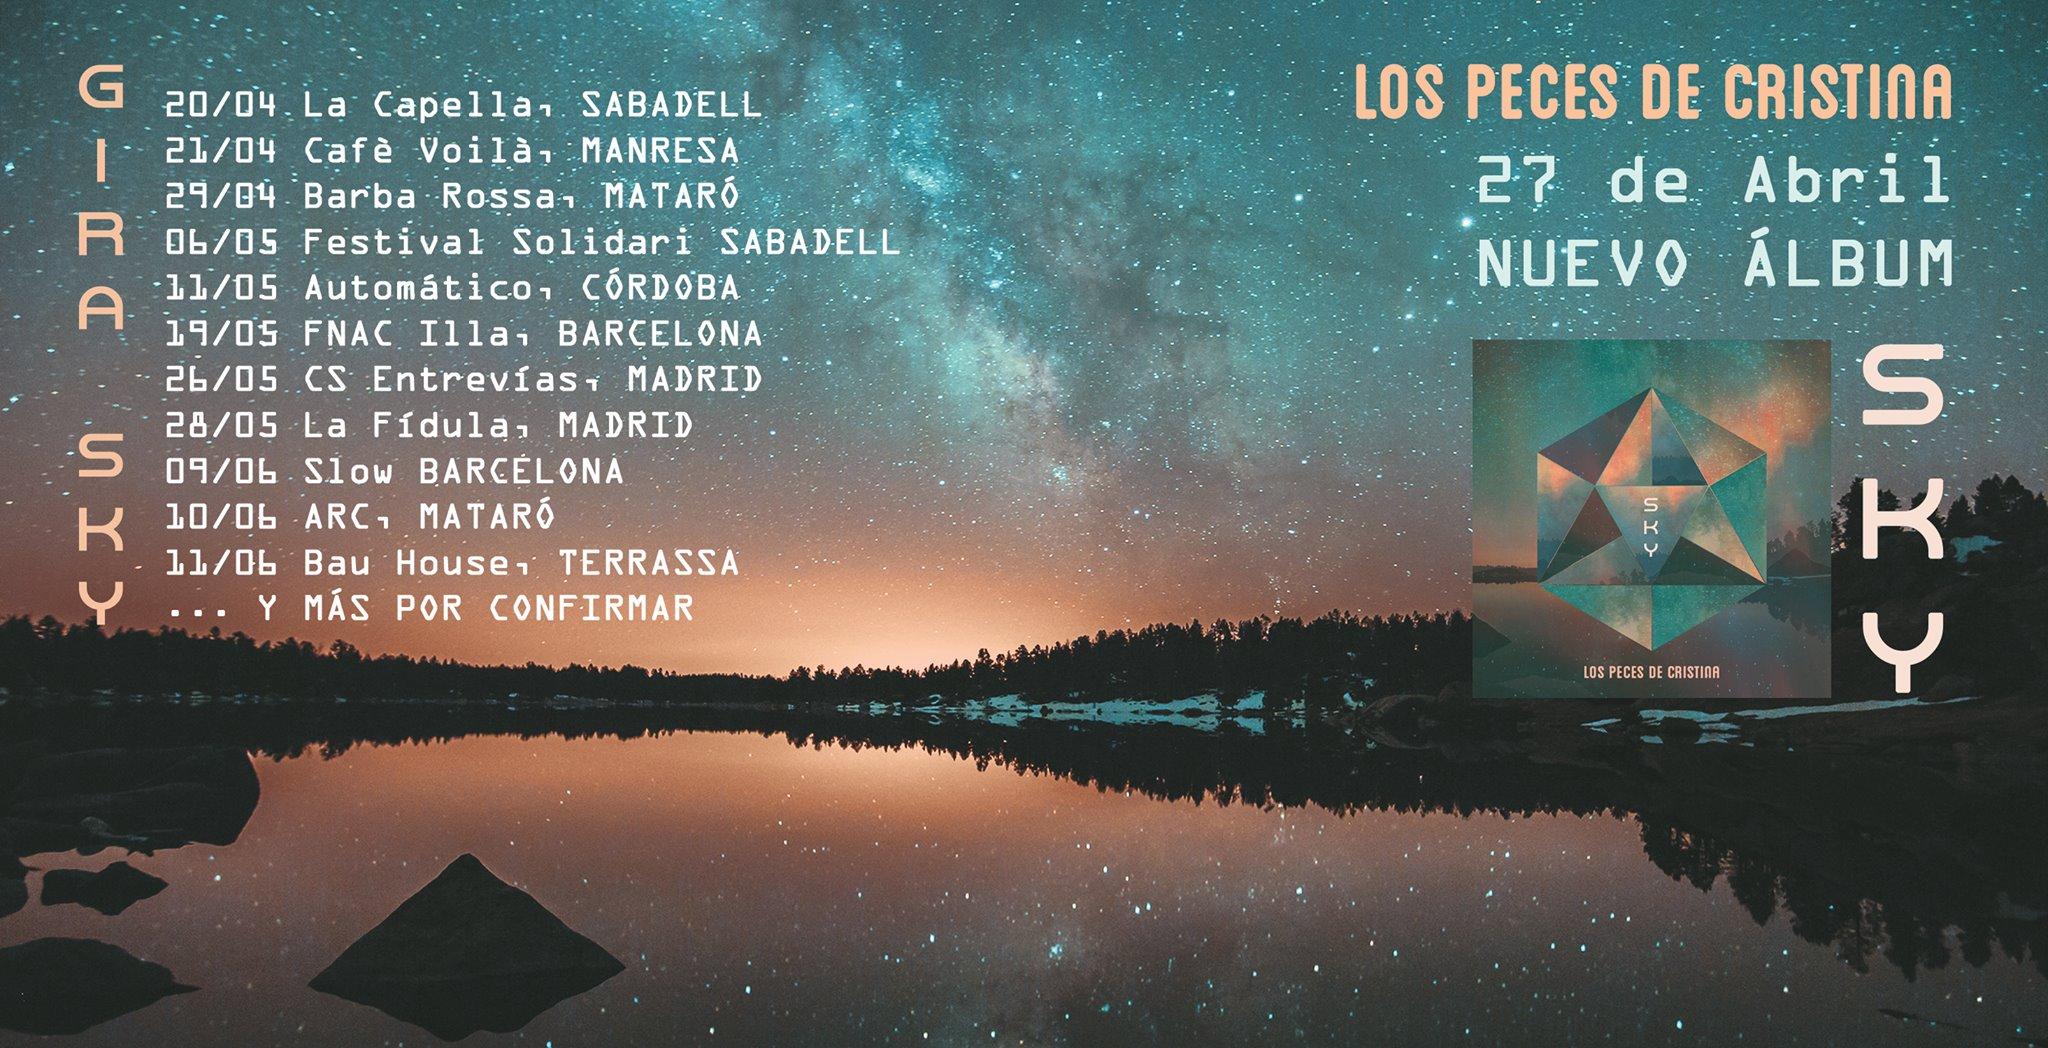 Los_Peces_de_Cristina-gira-sky-Slow-Barcelona